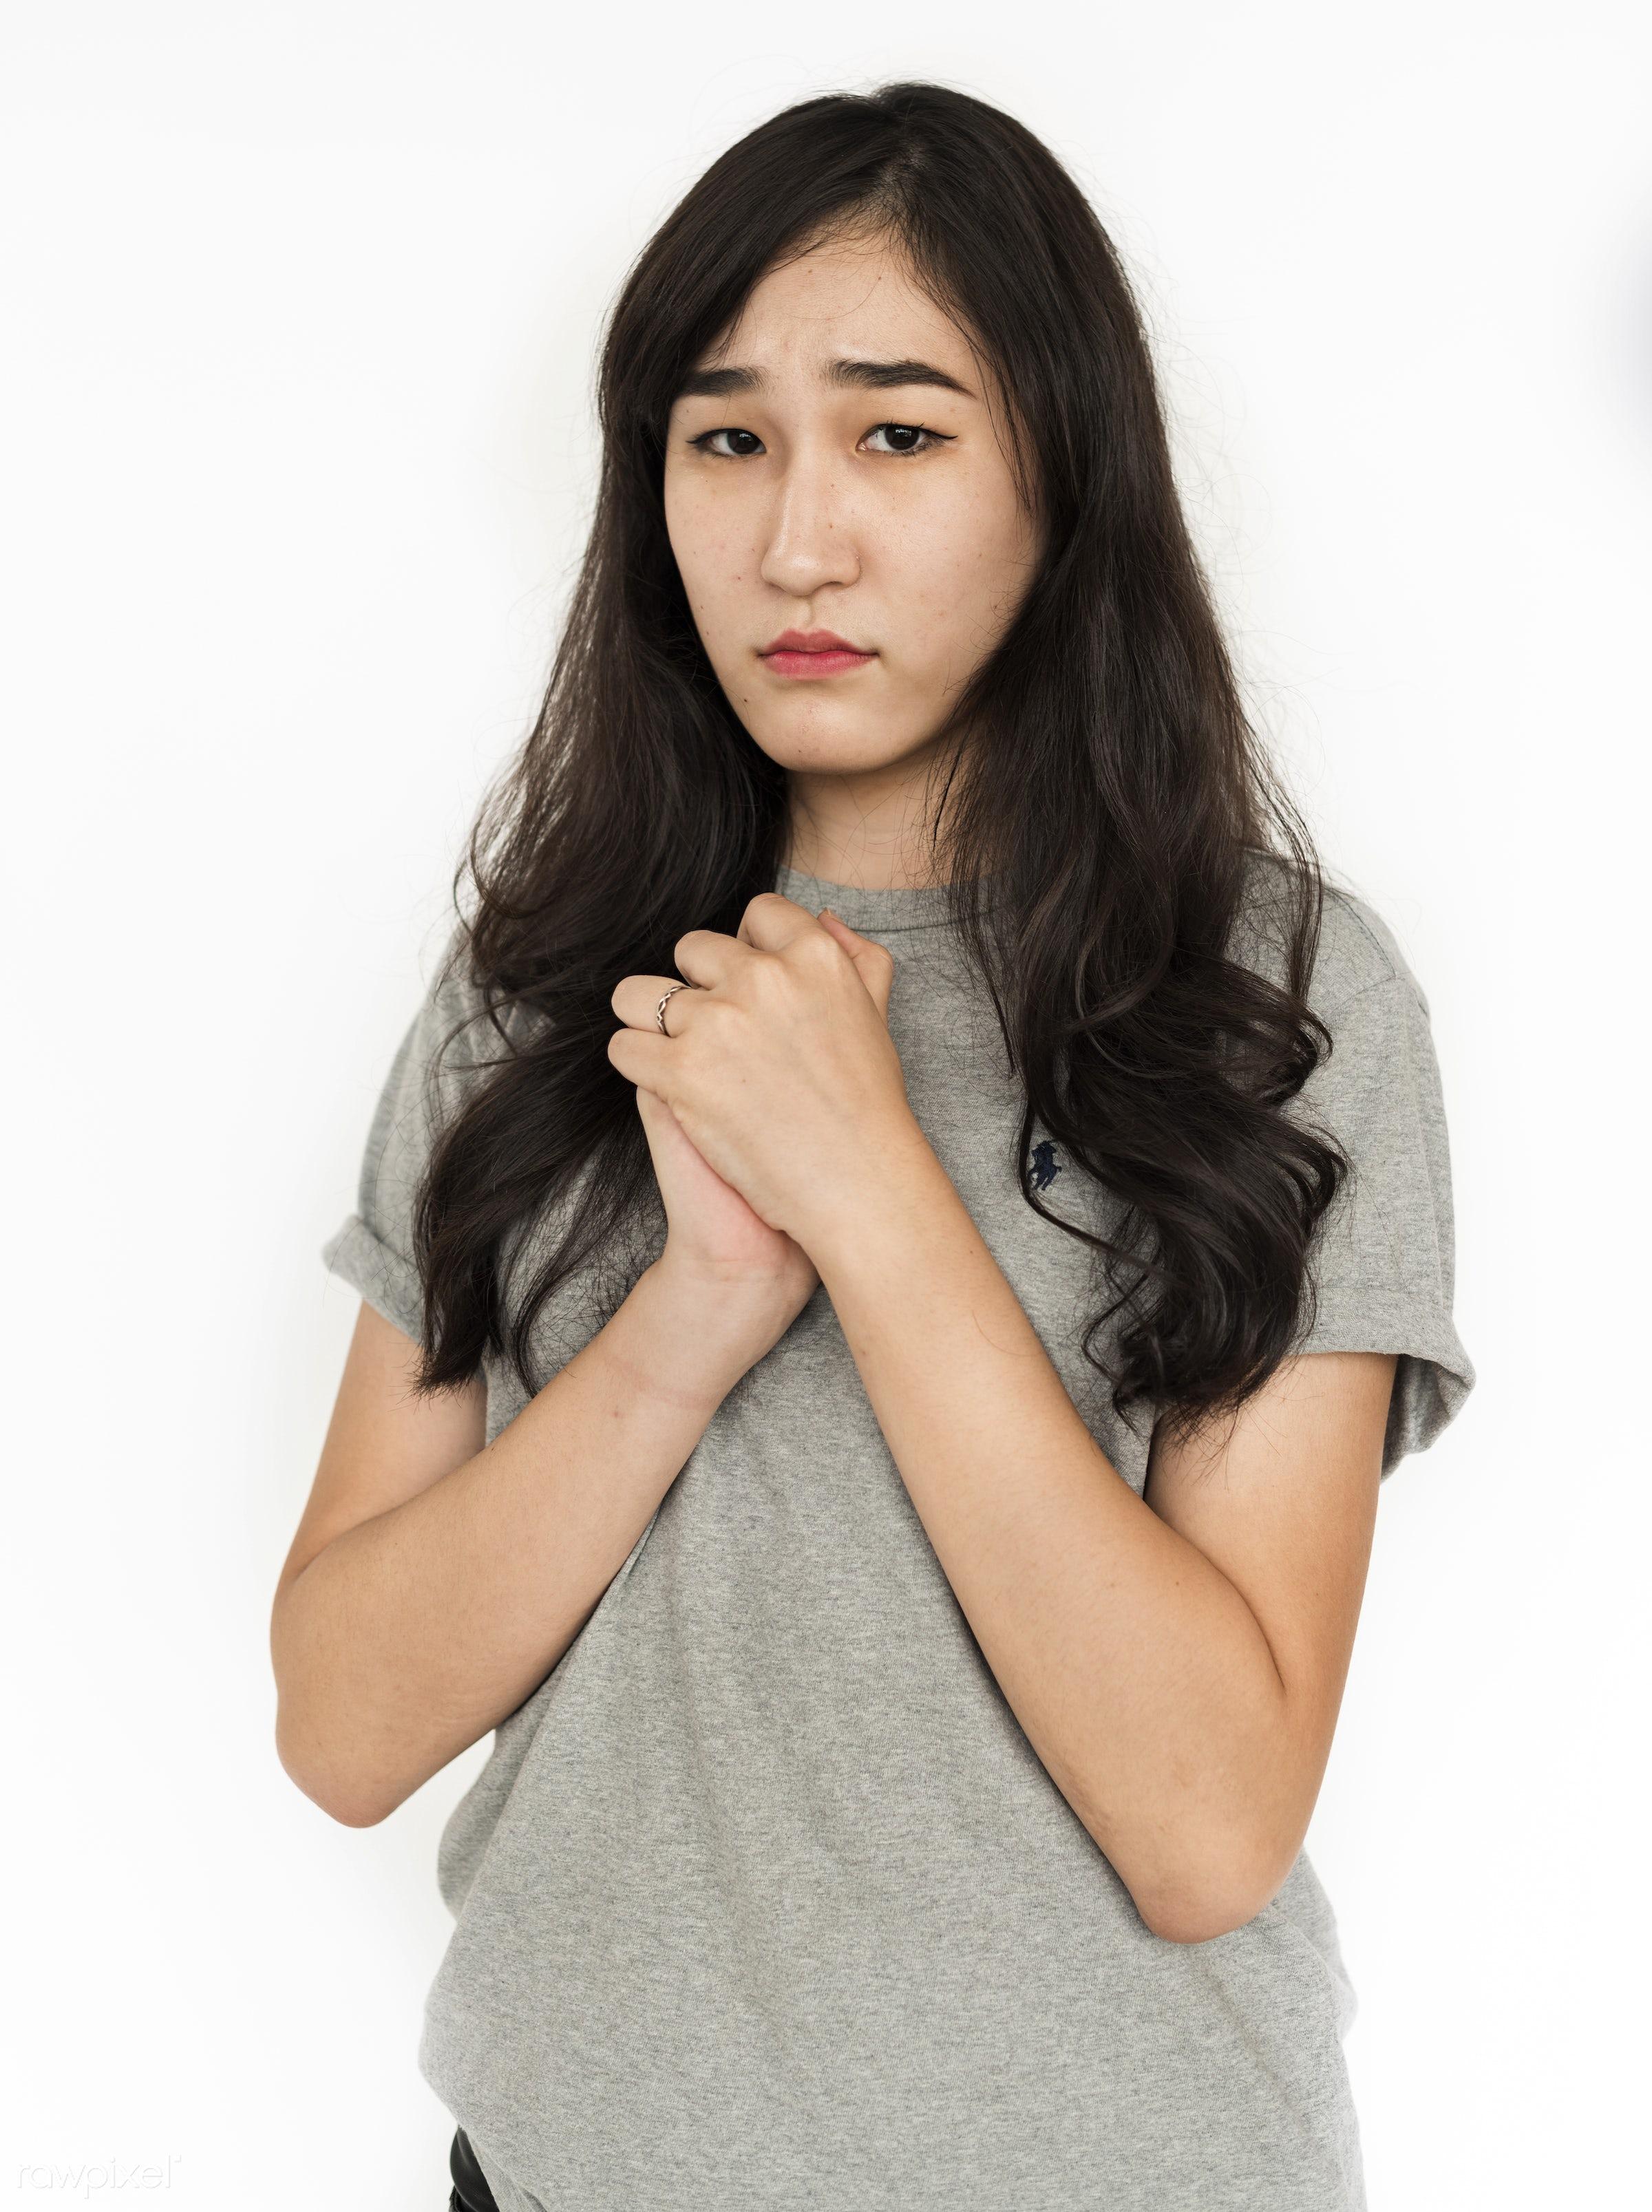 expression, studio, face, person, single, sadness, wish, sad, isolated on white, bored, asian ethnicity, style, upset, woman...